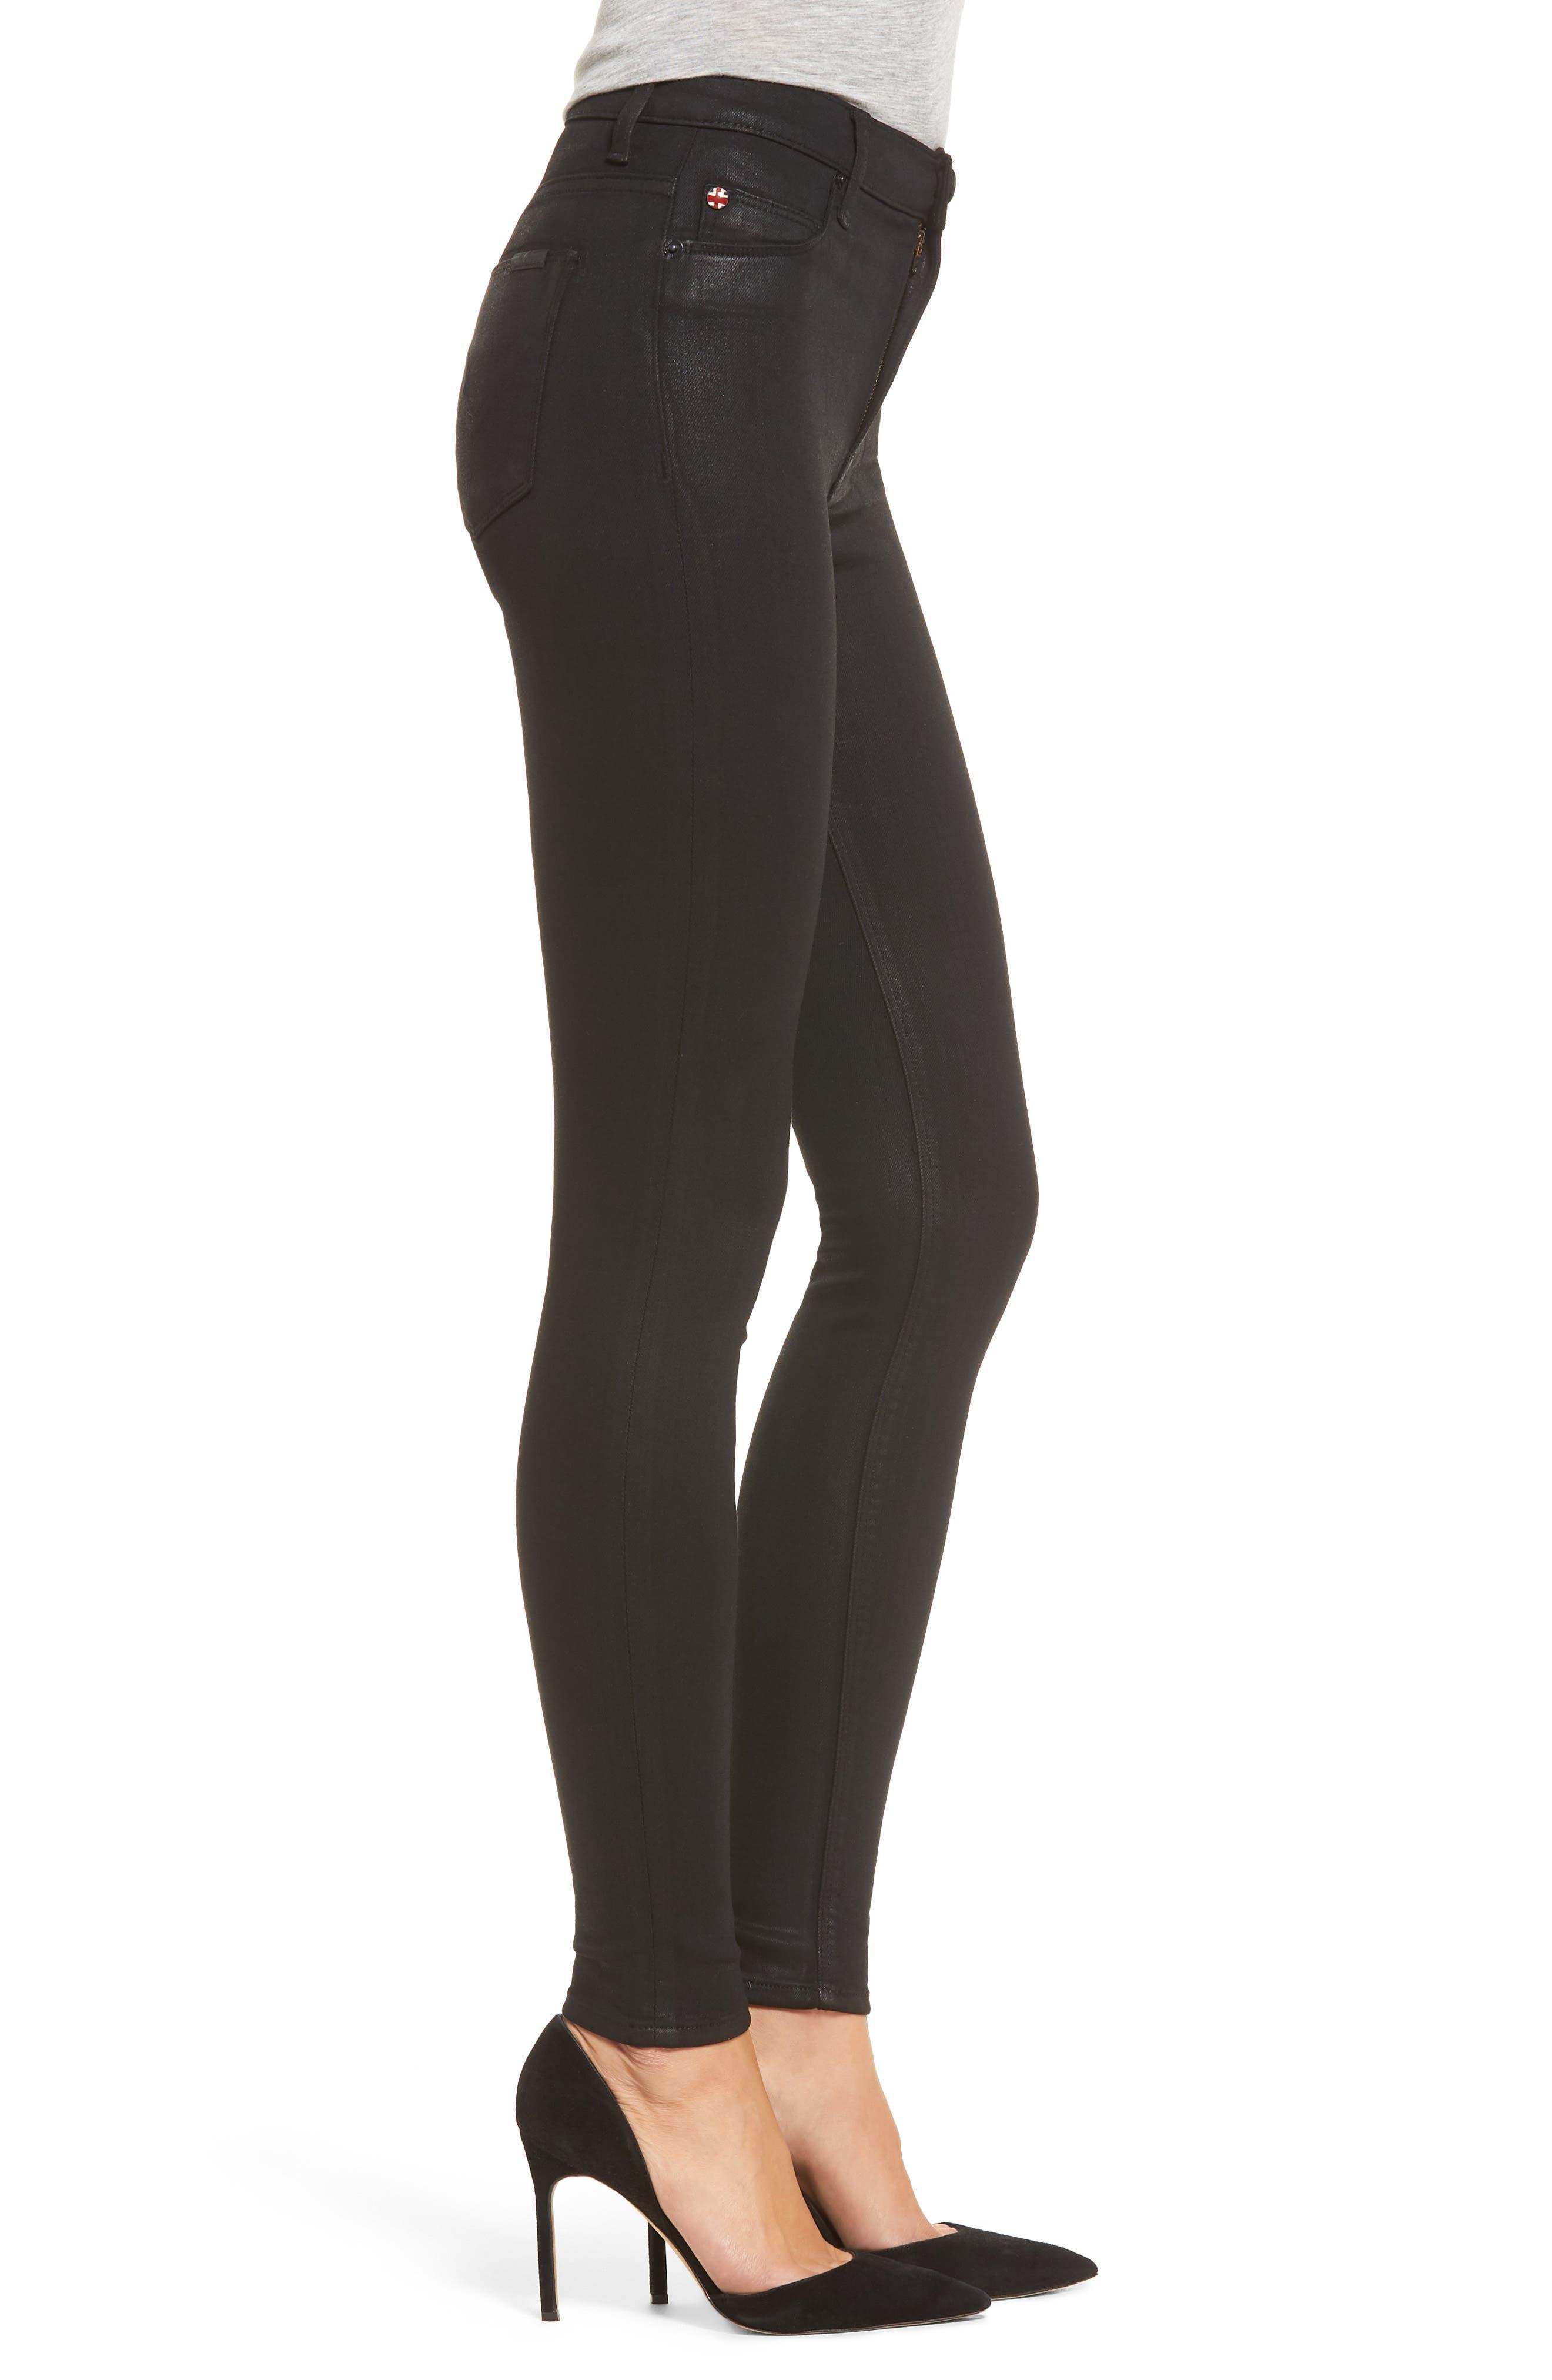 Barbara High Waist Skinny Jeans,                             Alternate thumbnail 3, color,                             Noir Coated